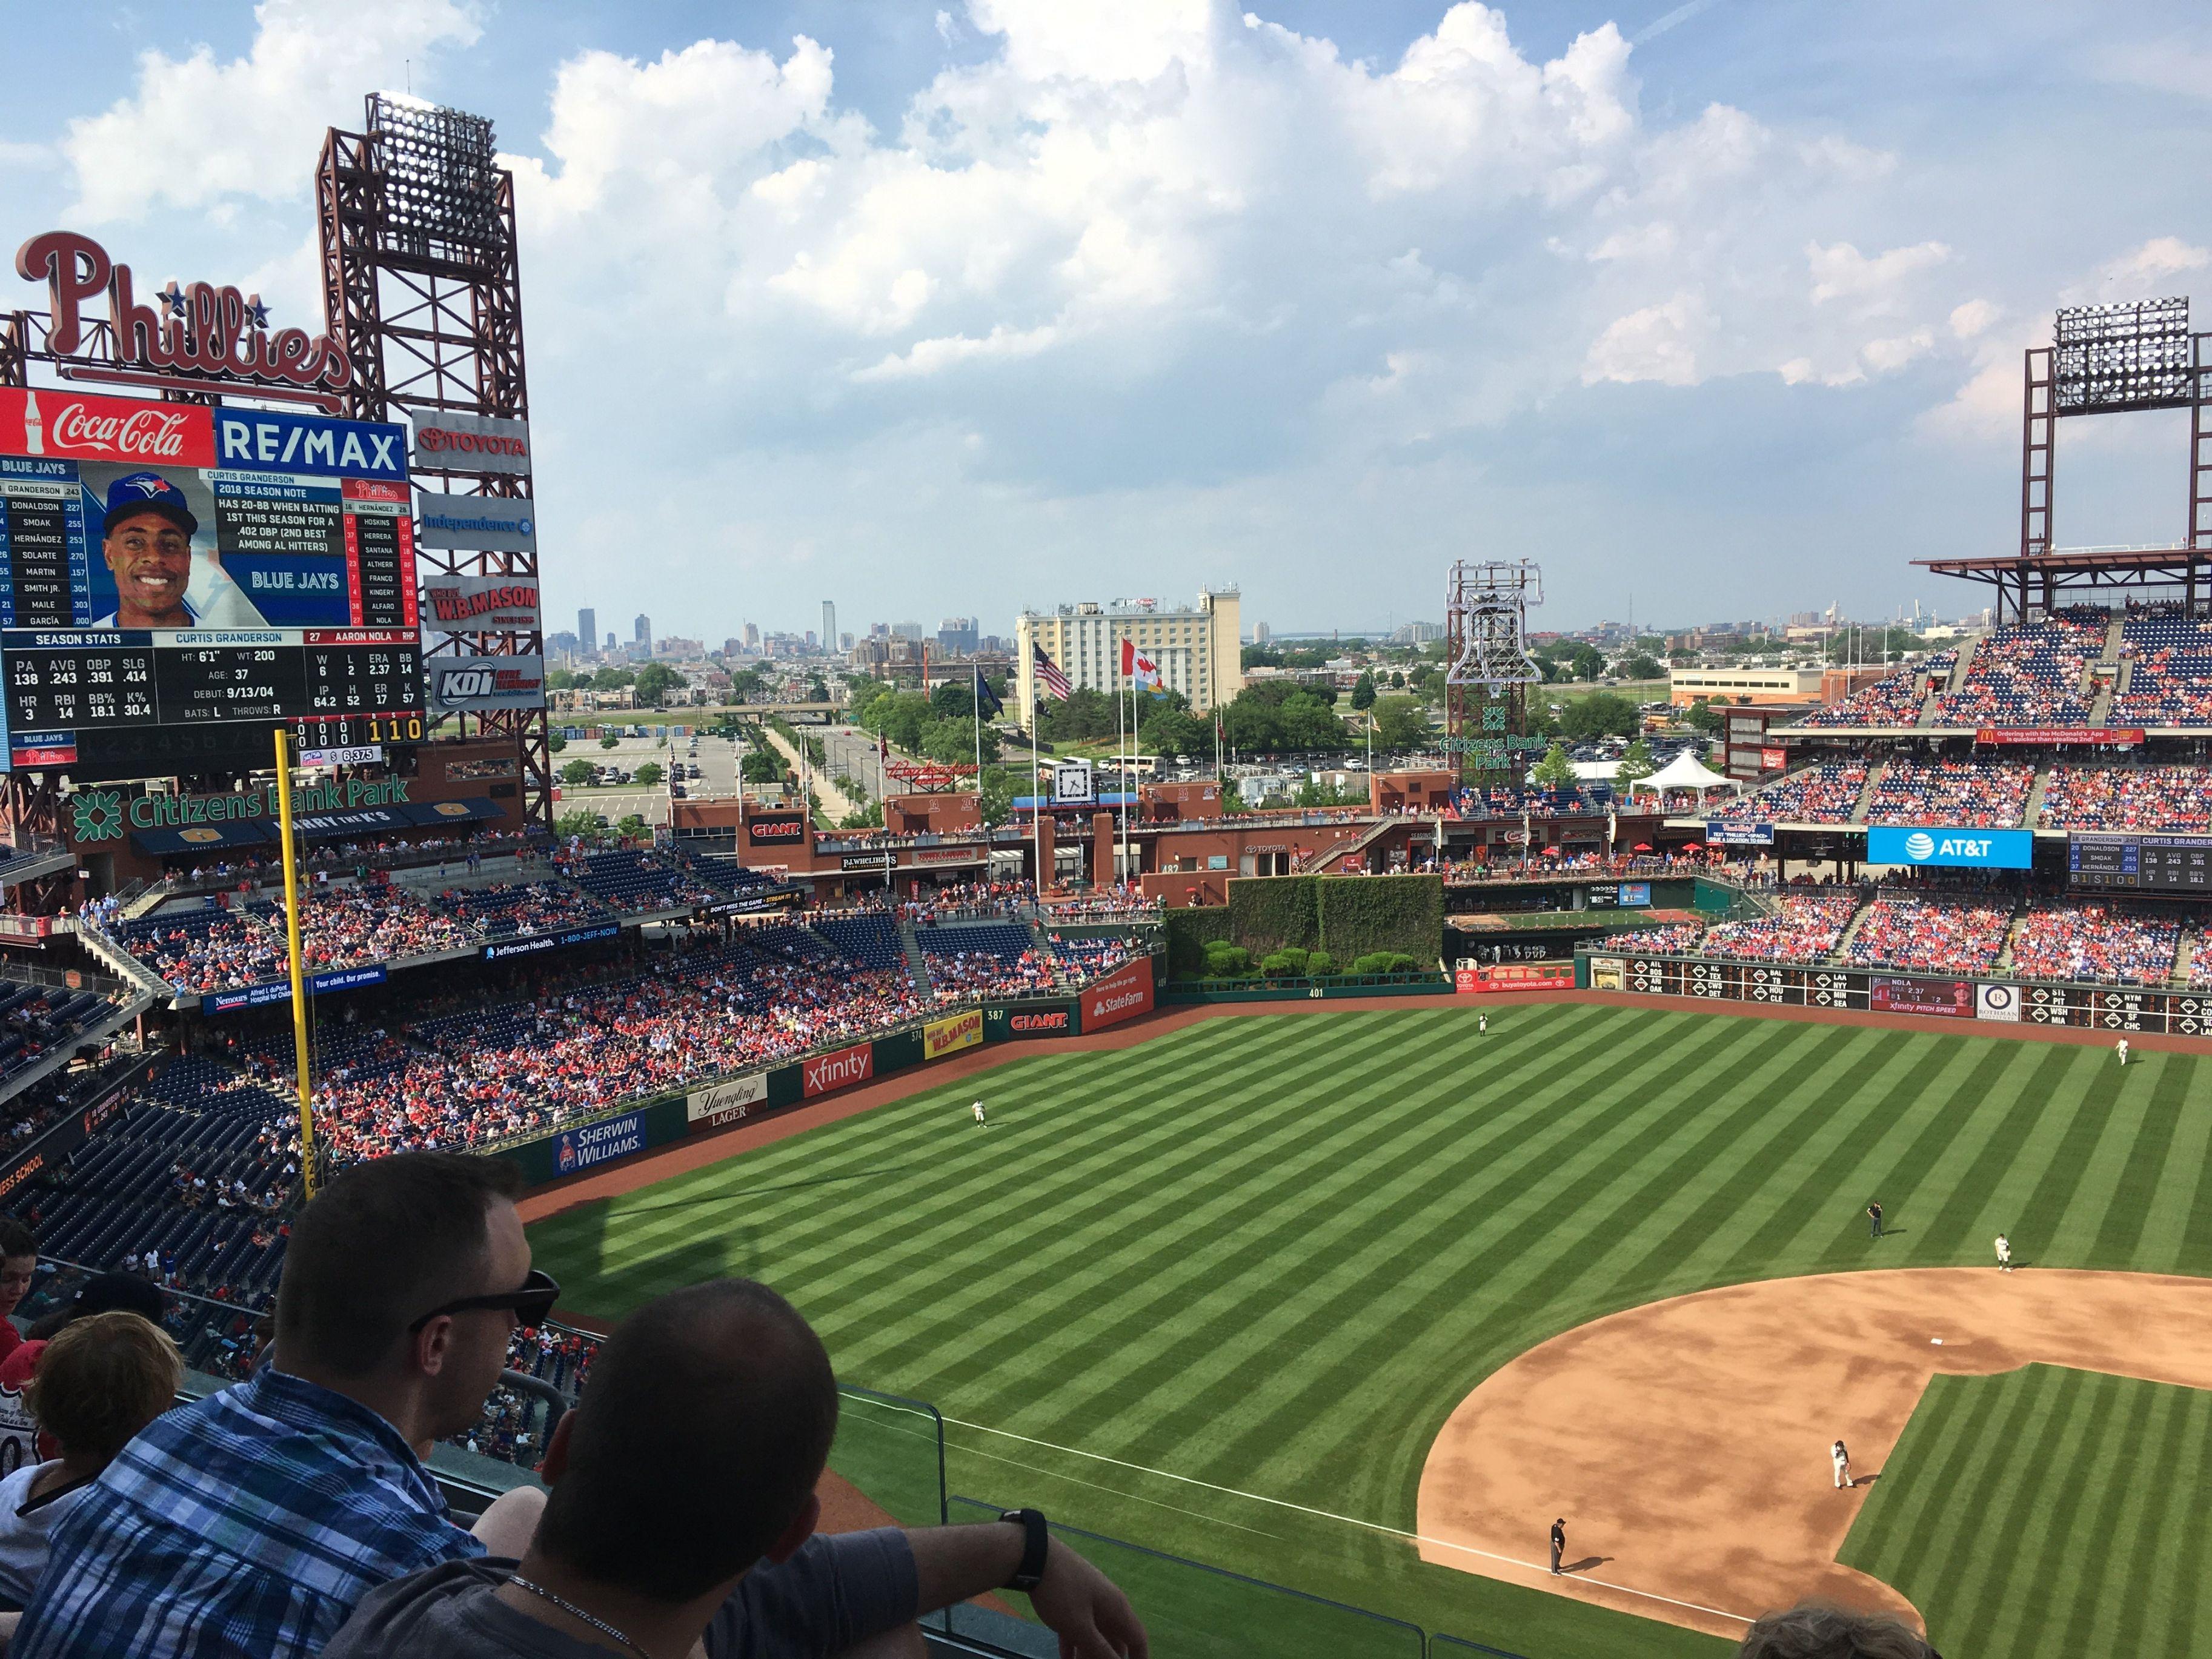 Citizens Bank Park: Home of the Philadelphia Phillies